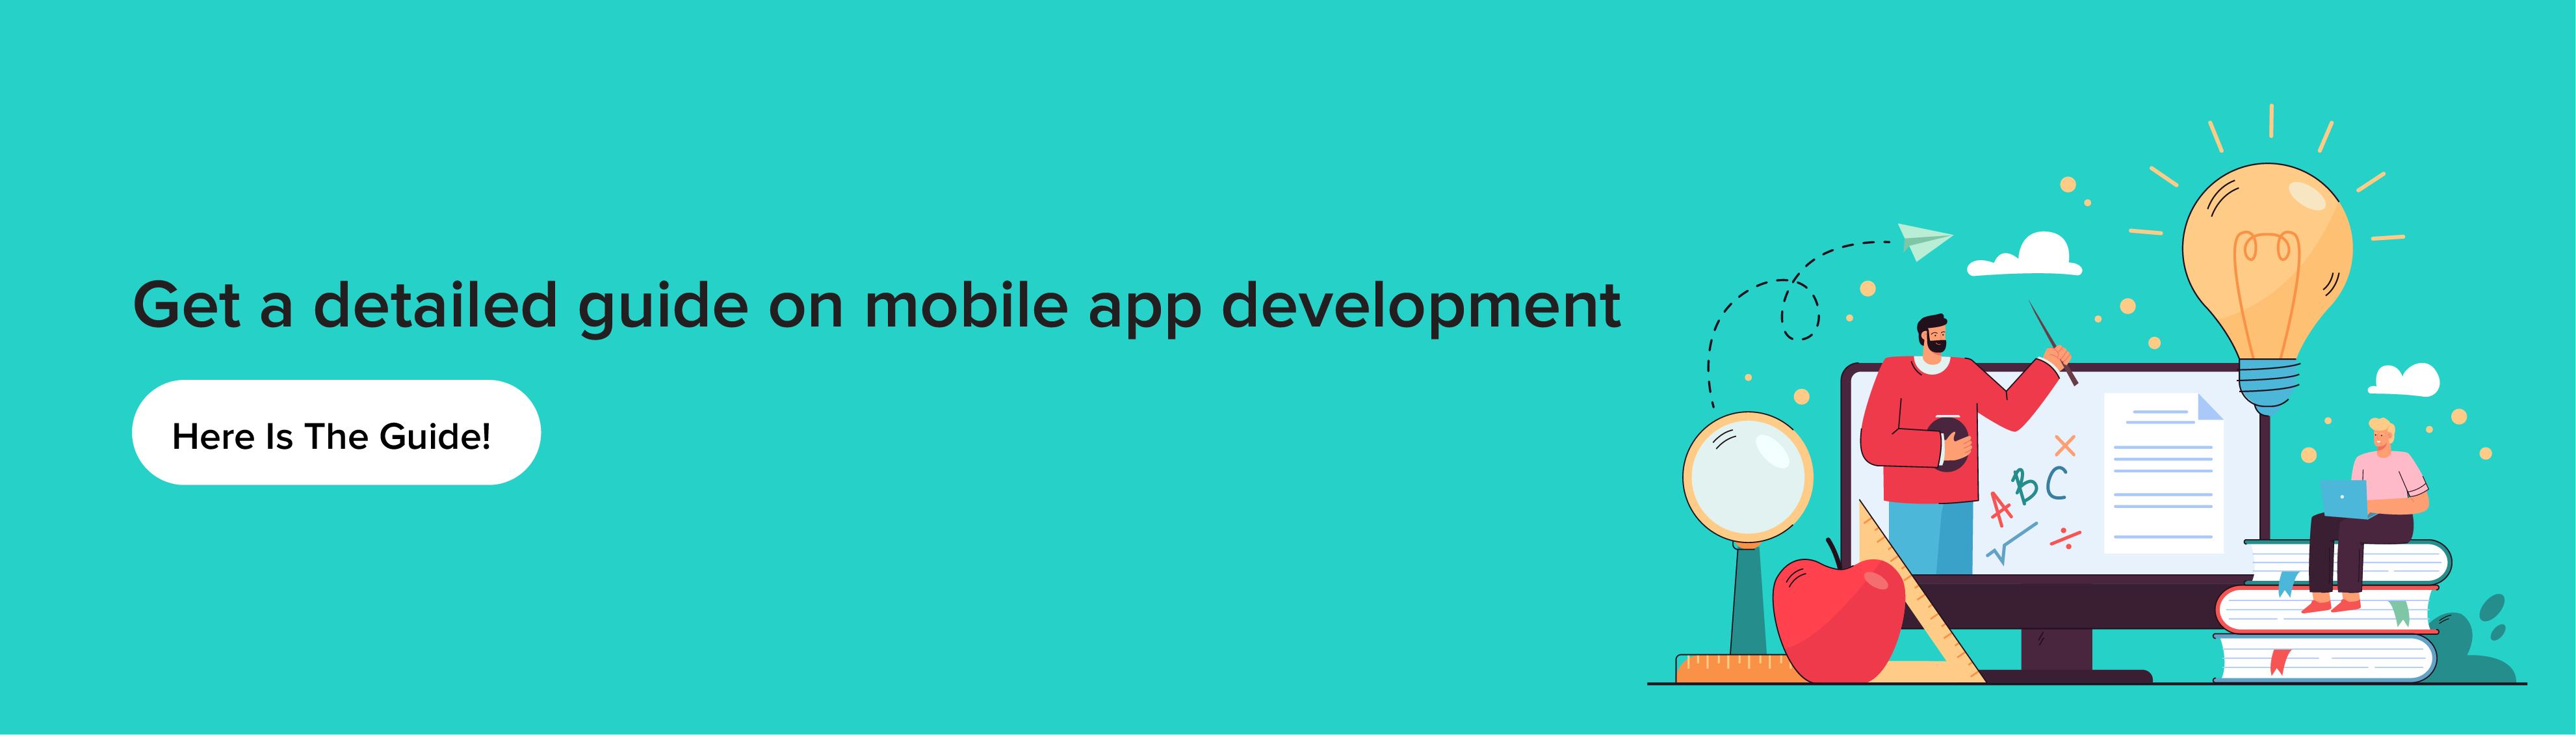 Mobile-app-development-guide